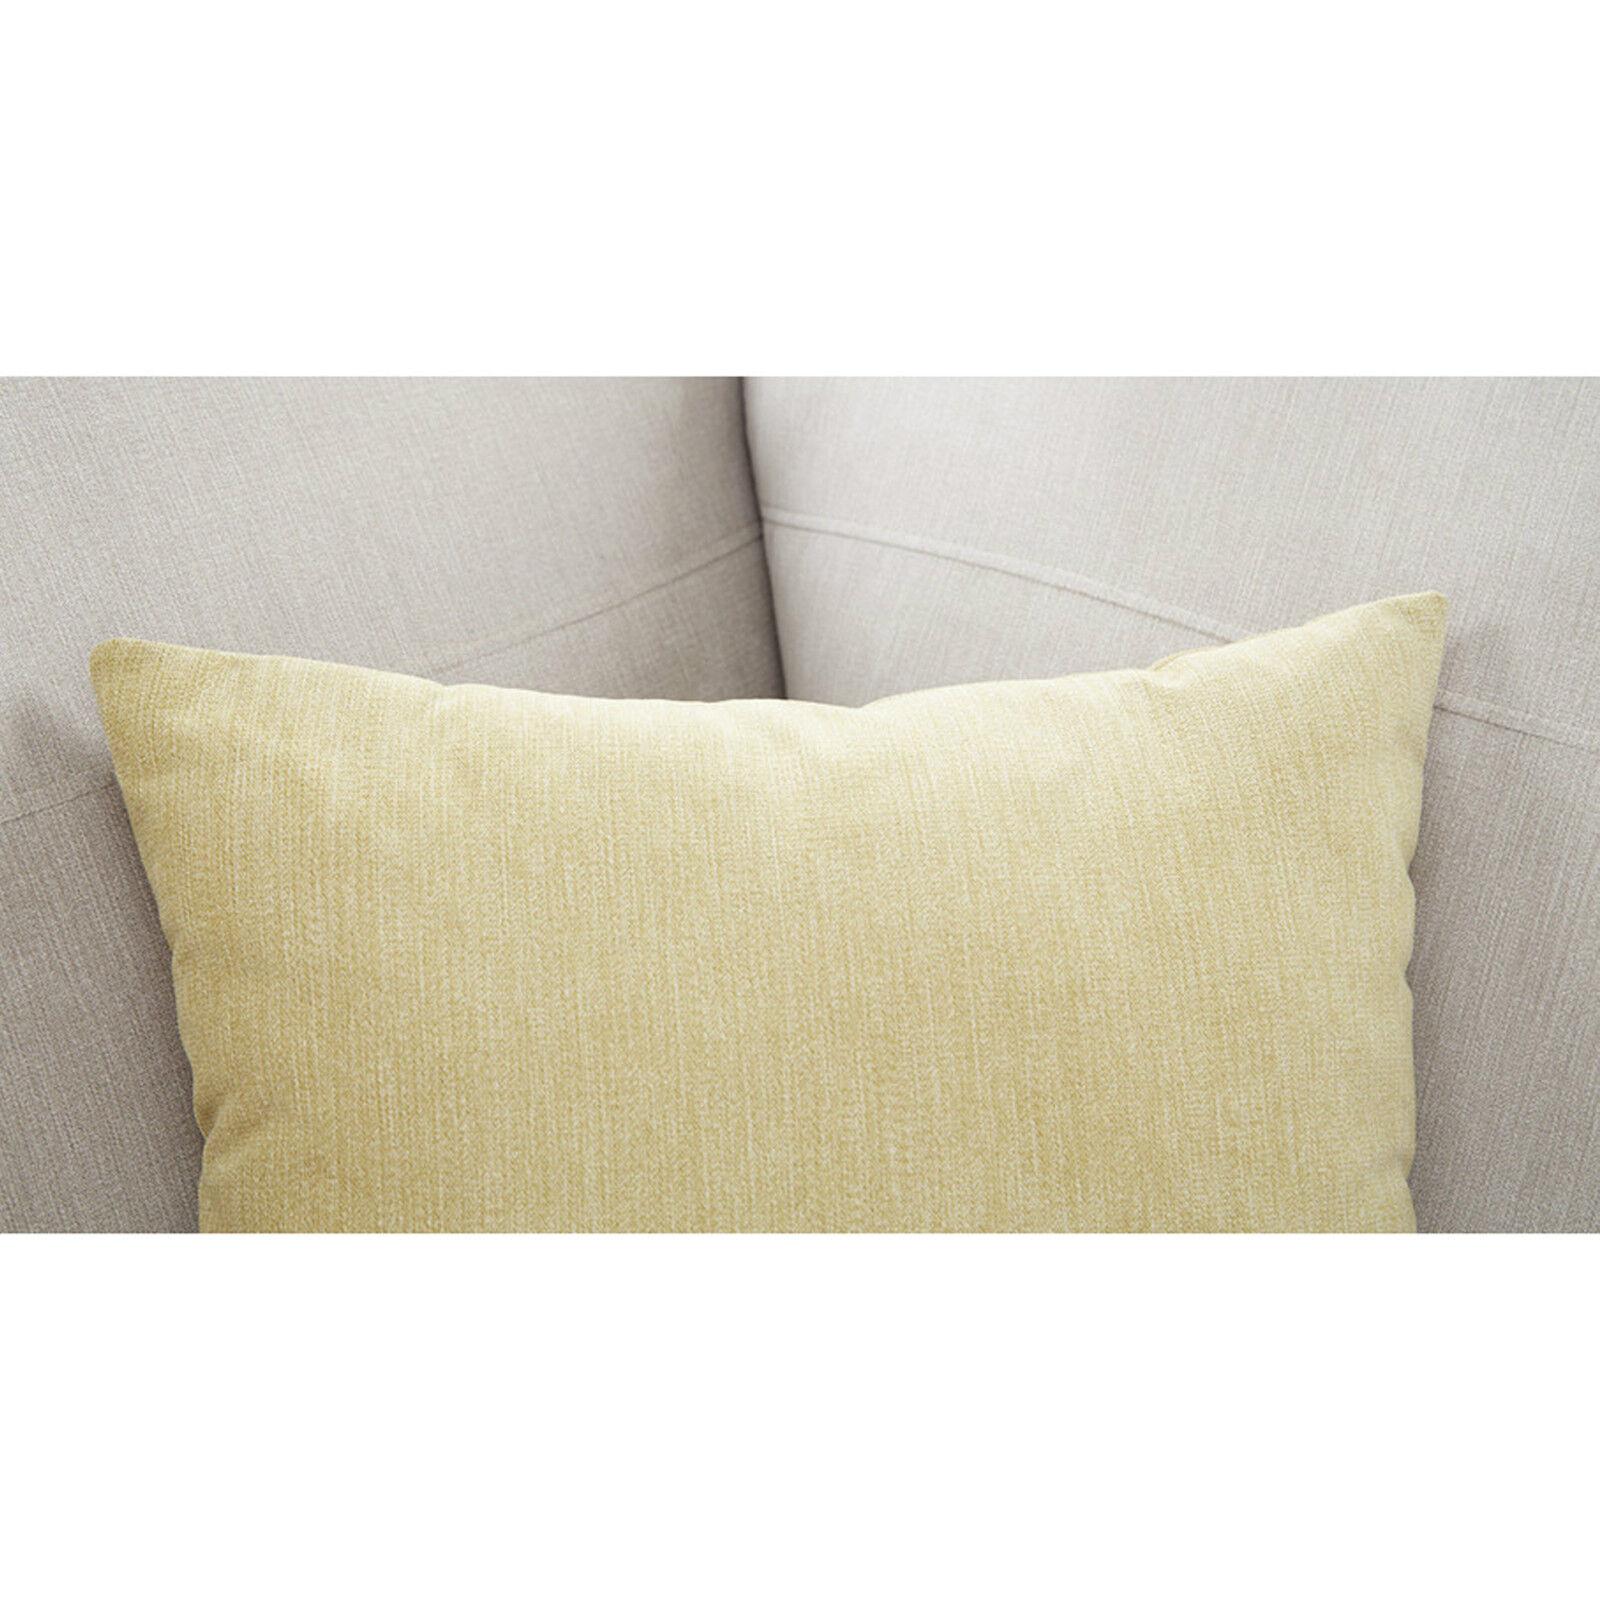 soft sofa material beautiful sofas plain chenille designer upholstery fabric